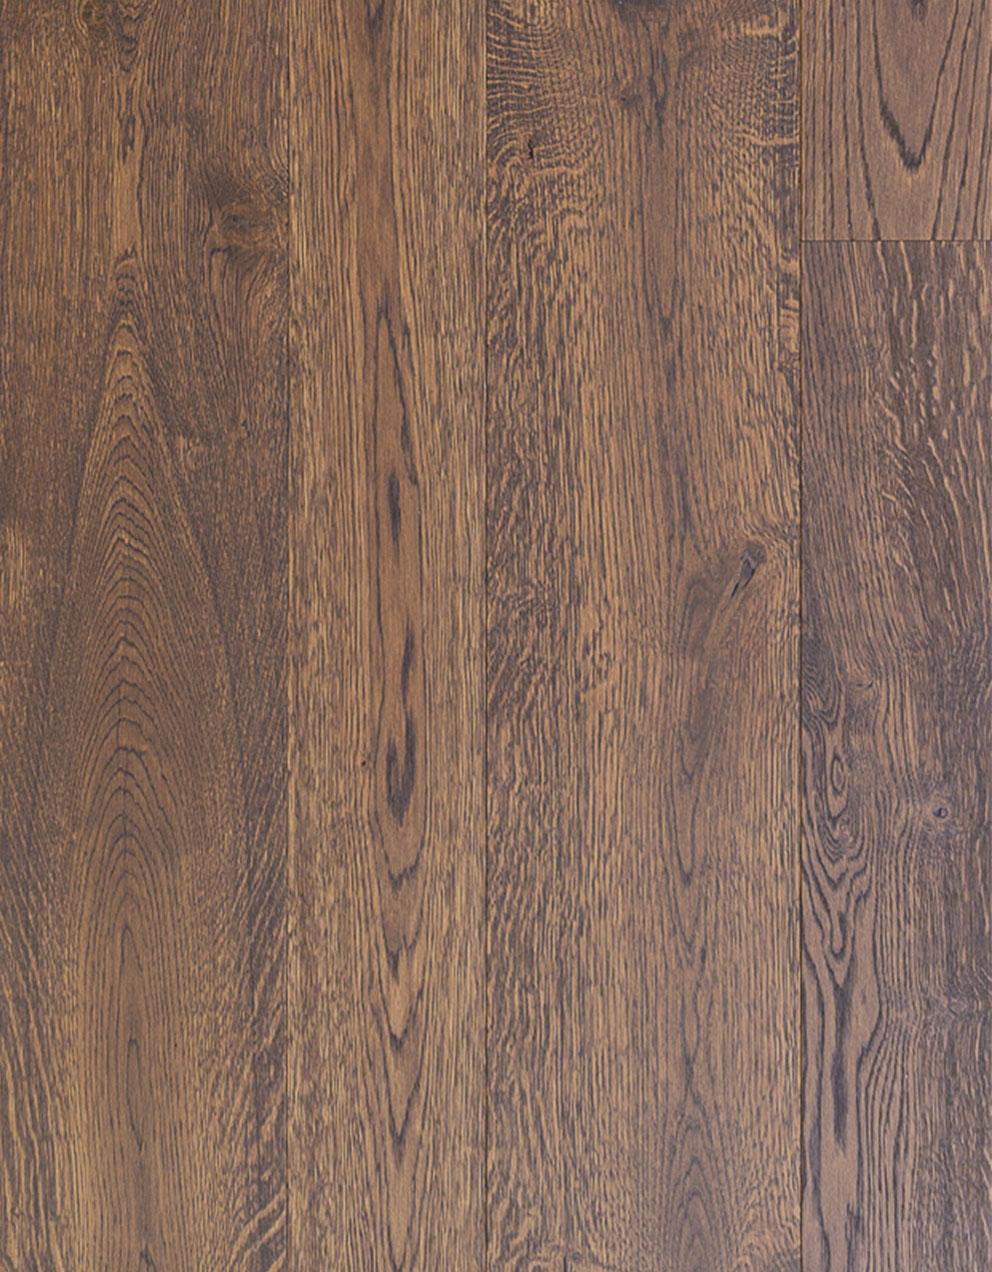 Tarima de madera Roble Francés oscuro